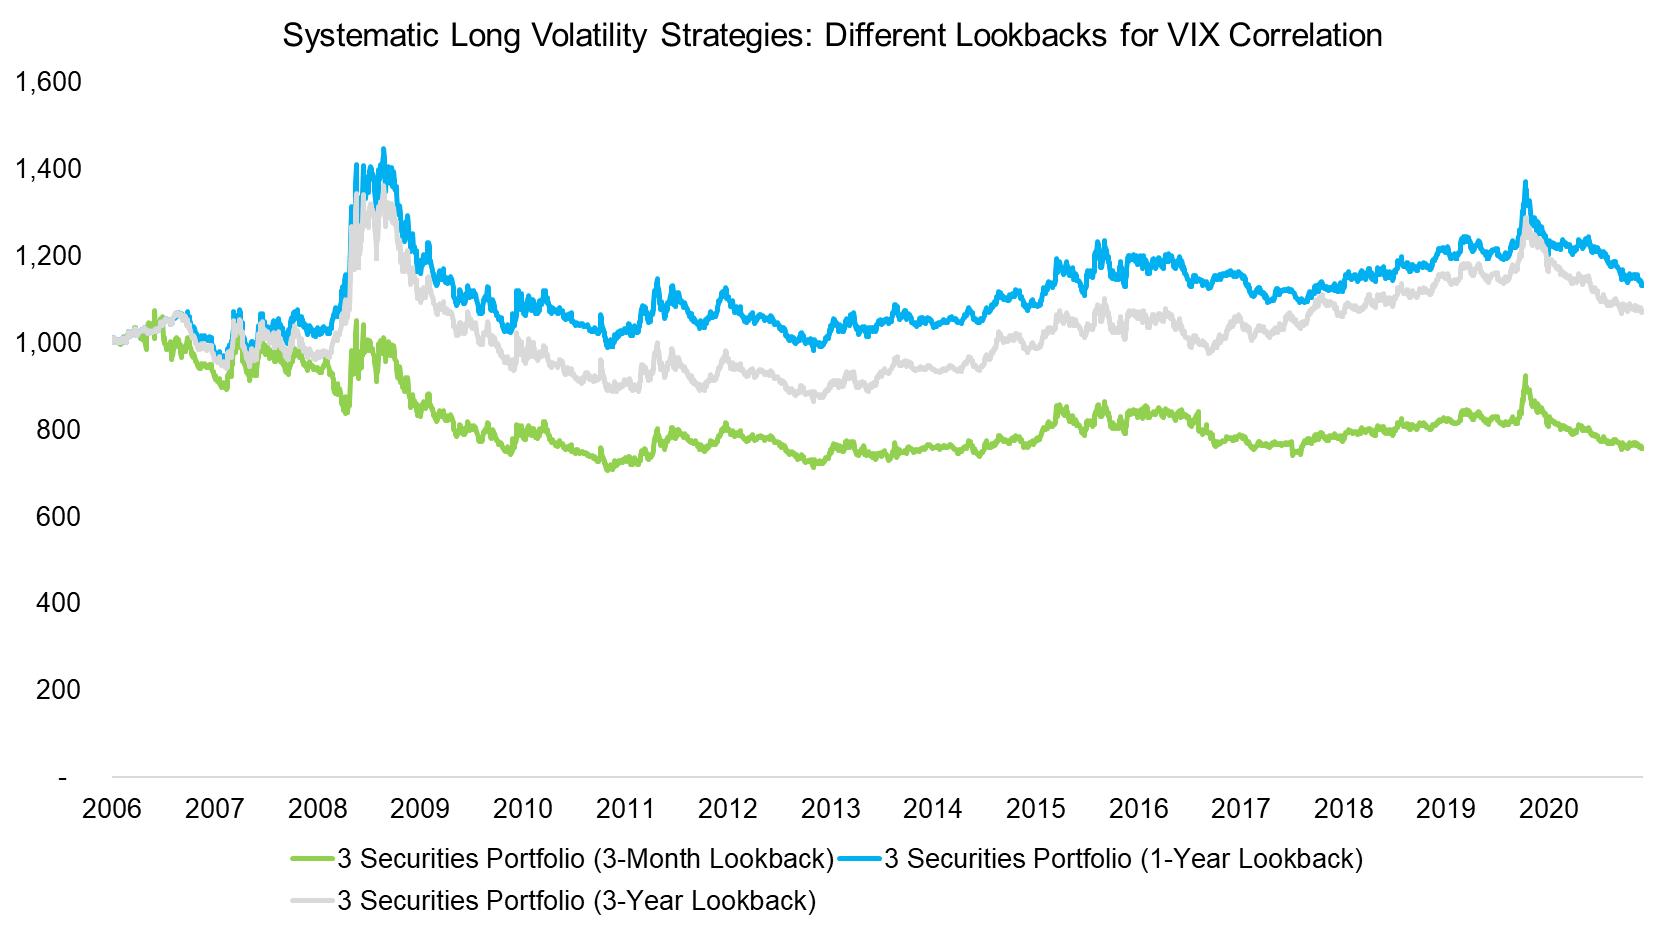 Systematic Long Volatility Strategies Different Lookbacks for VIX Correlation